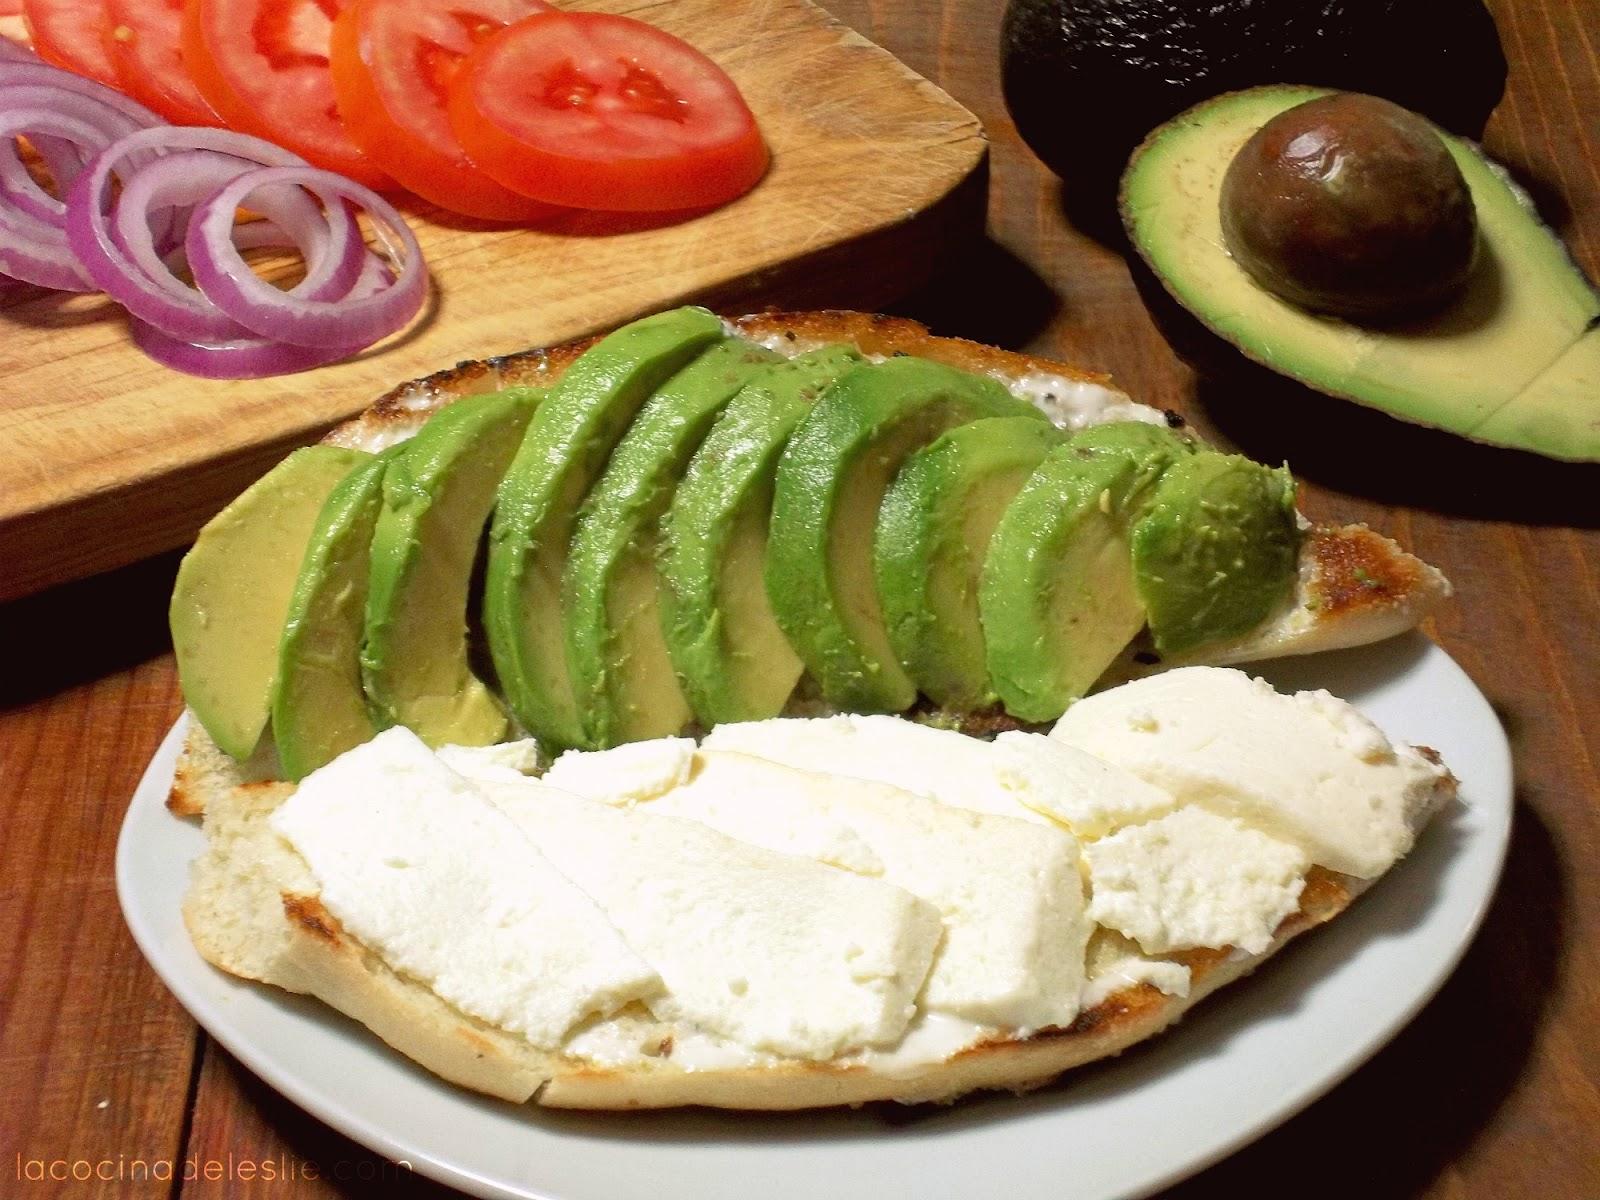 Lonche de Aguacate con Queso #amolosaguacates - La Cocina